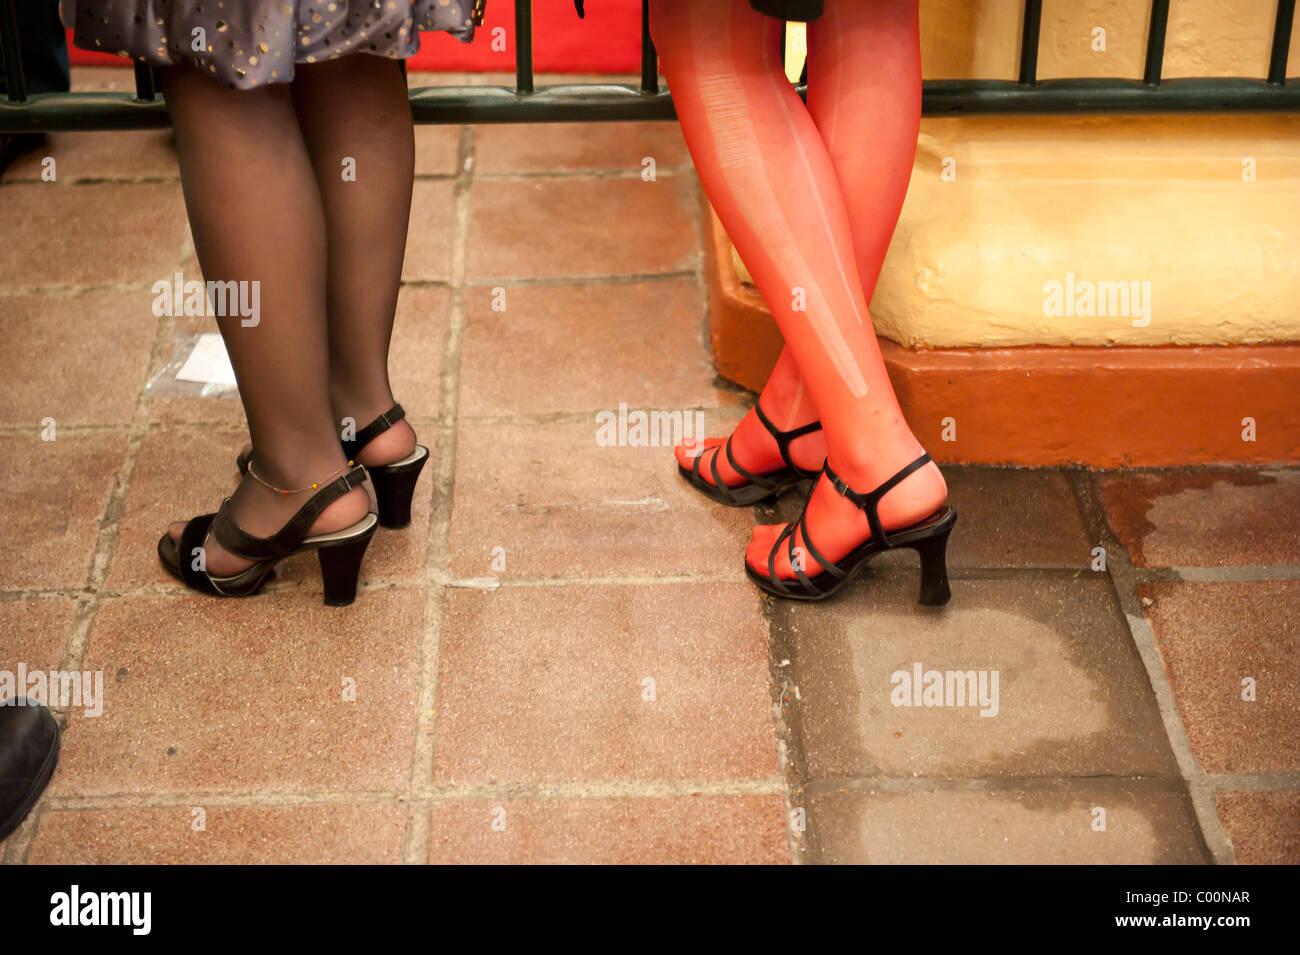 Stockings Run High Resolution Stock